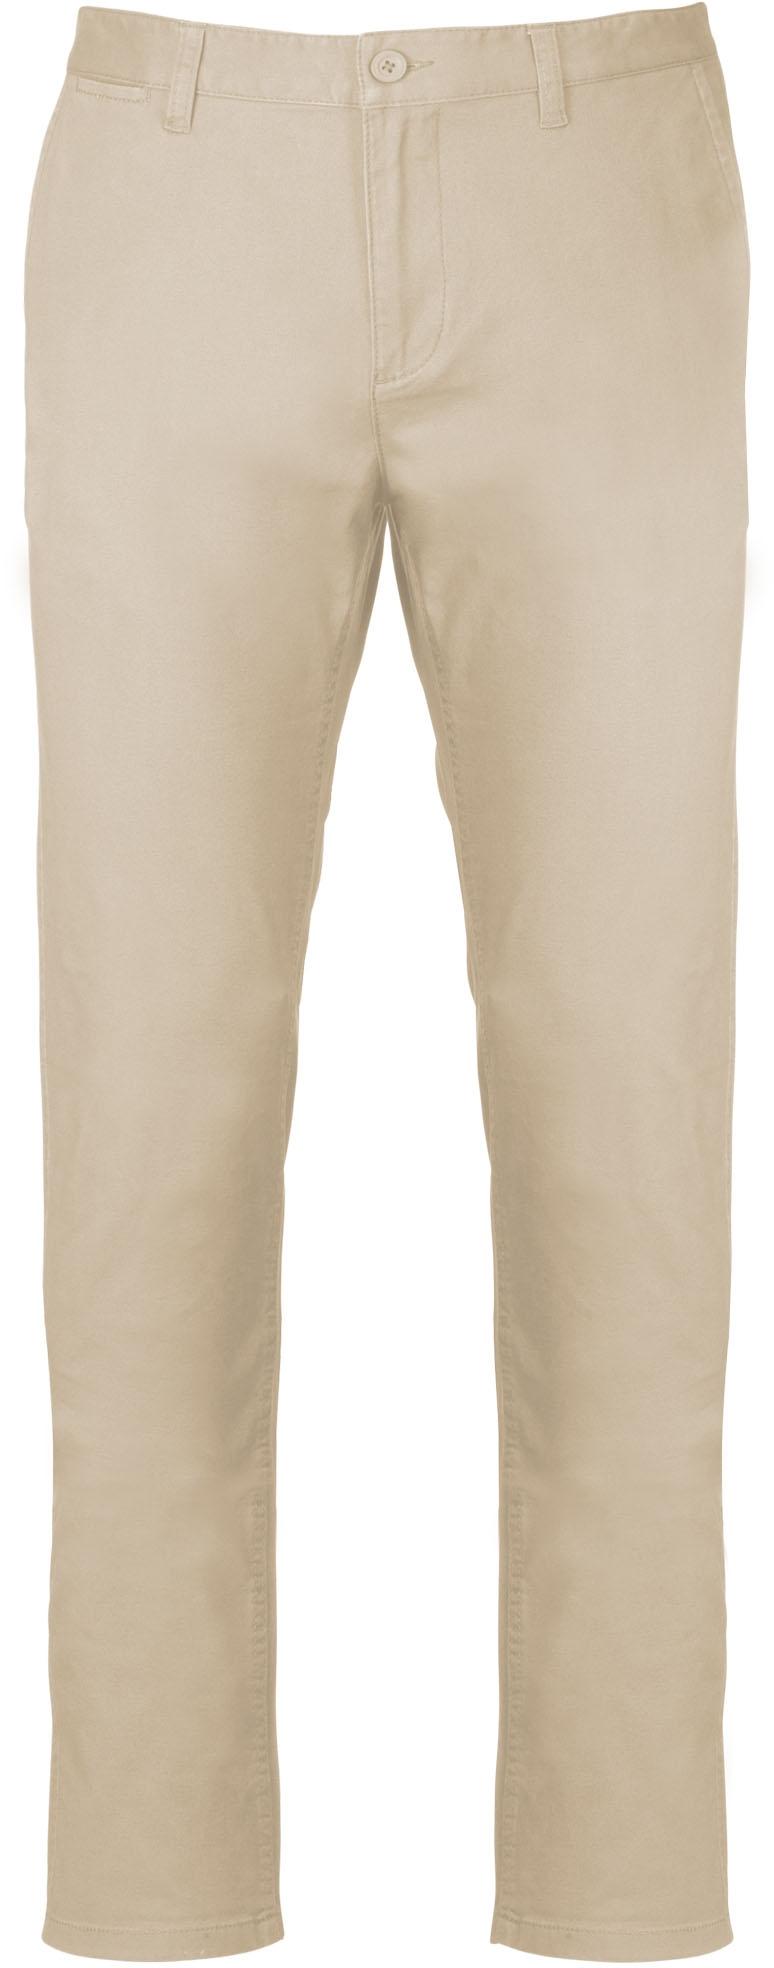 Pantalon chino homme - 2-1478-3